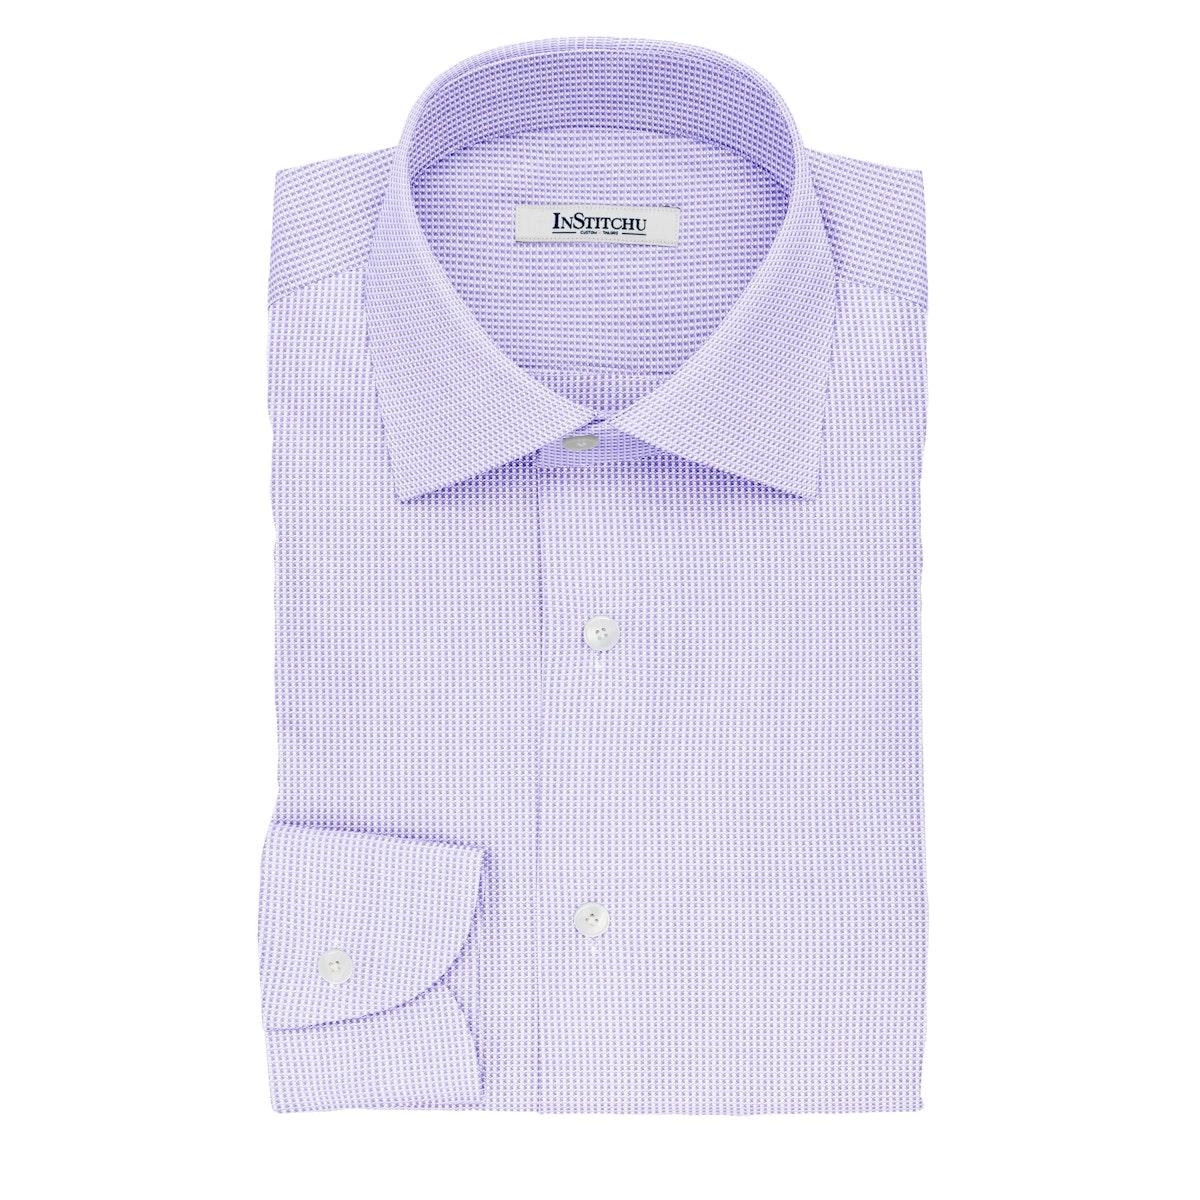 InStitchu Collection The Twain Violet Pincheck Cotton Shirt